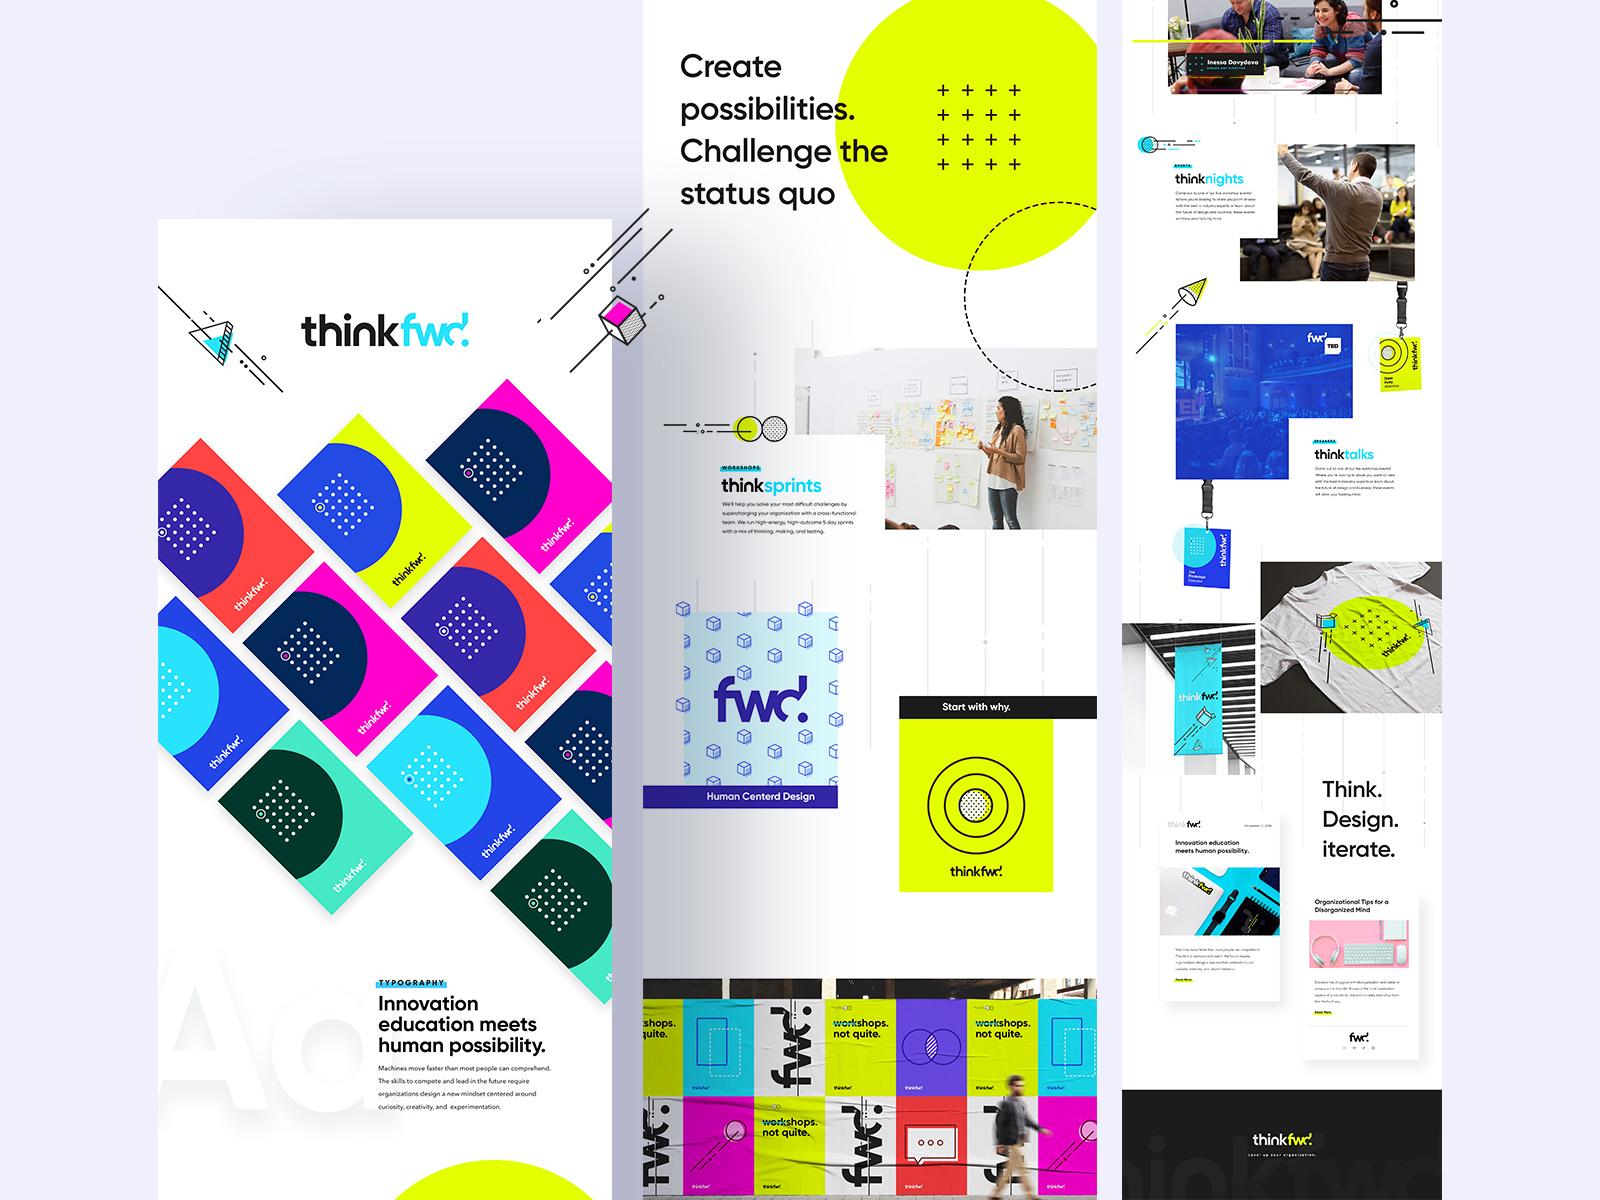 Thinkfwd design study